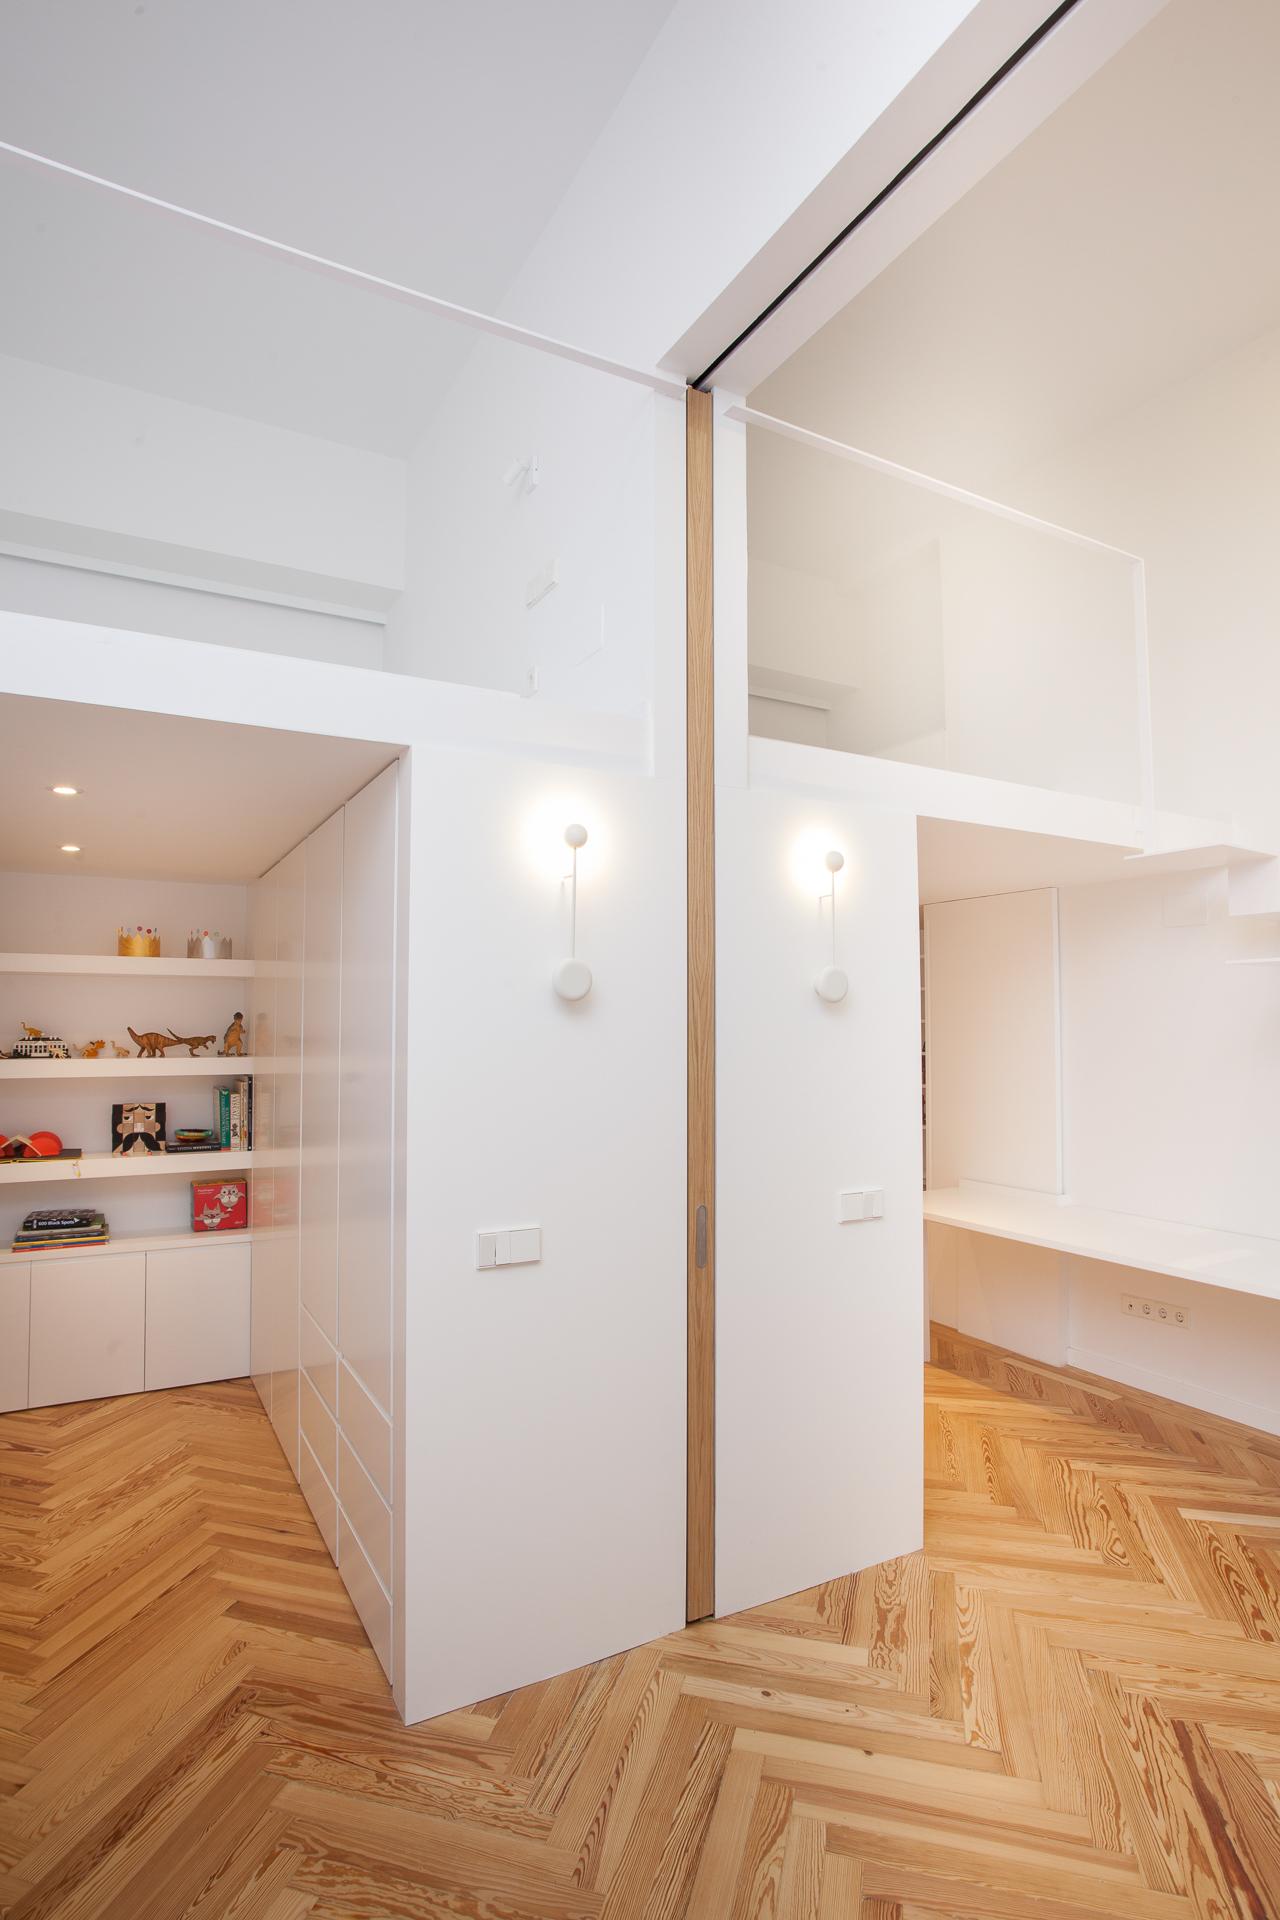 SALESAS_Maroto_Ibañez_arquitectos11